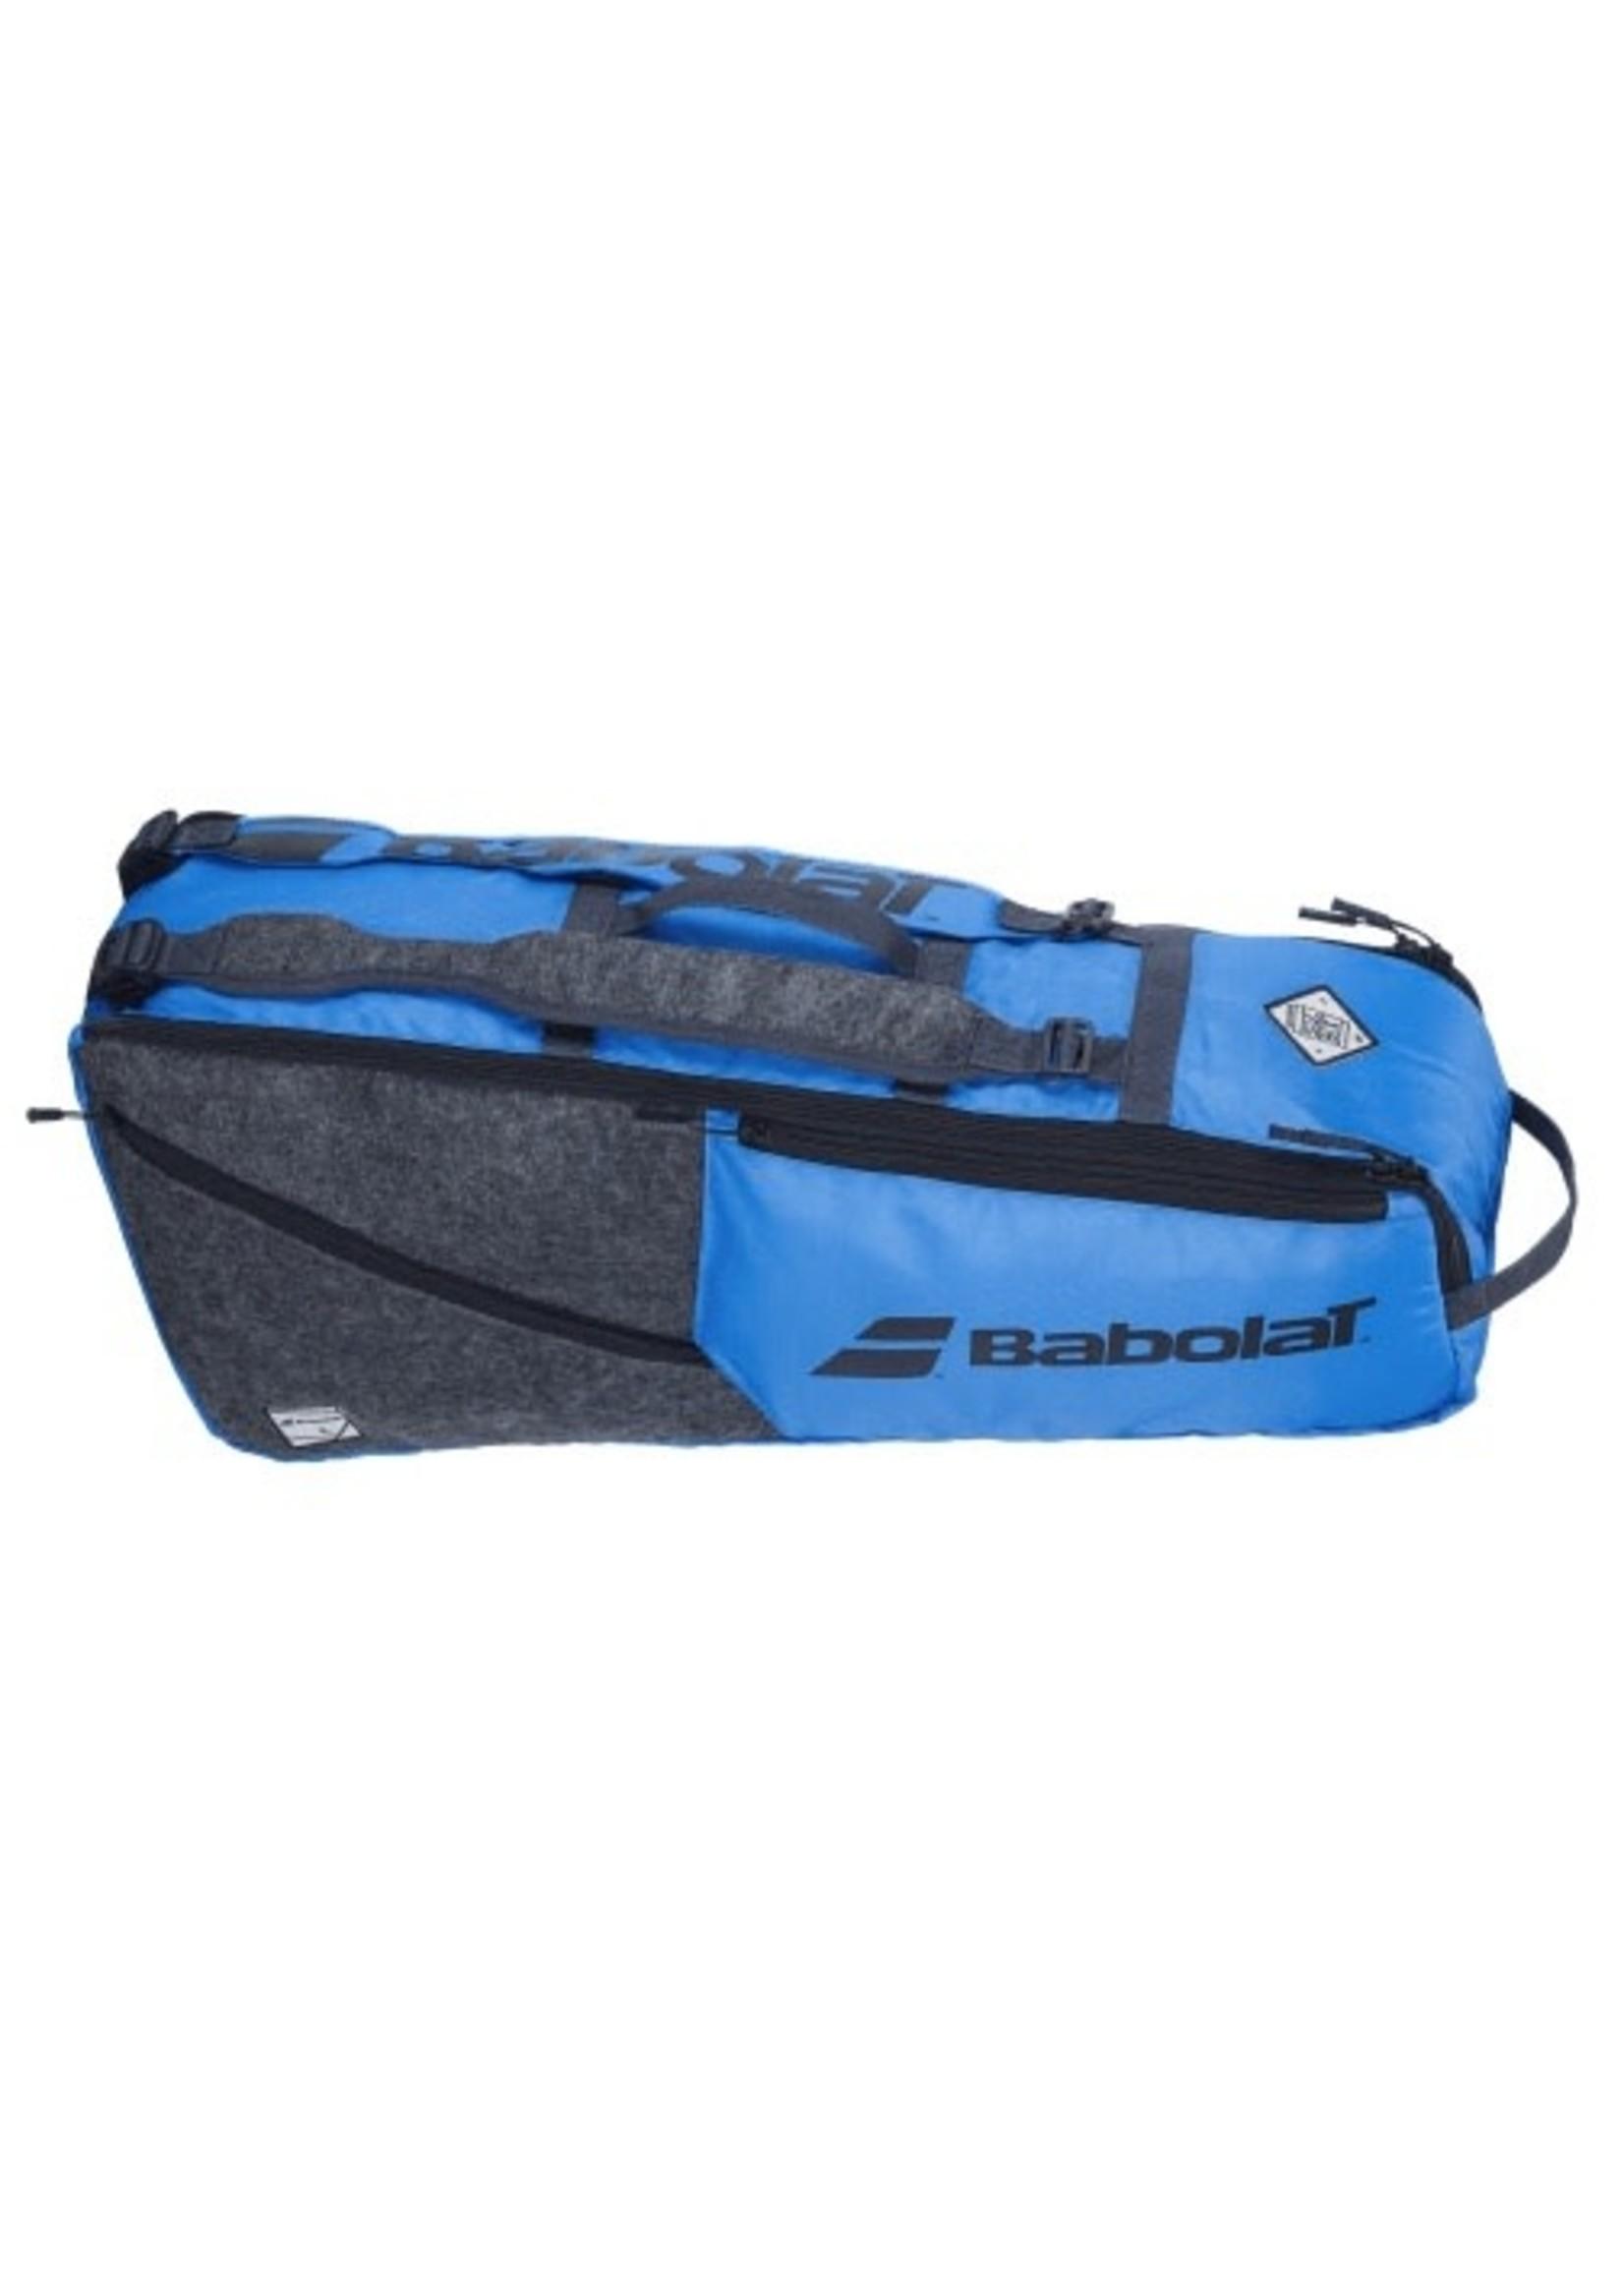 Babolat Babolat RH6 Evo Racket Bag (2021)